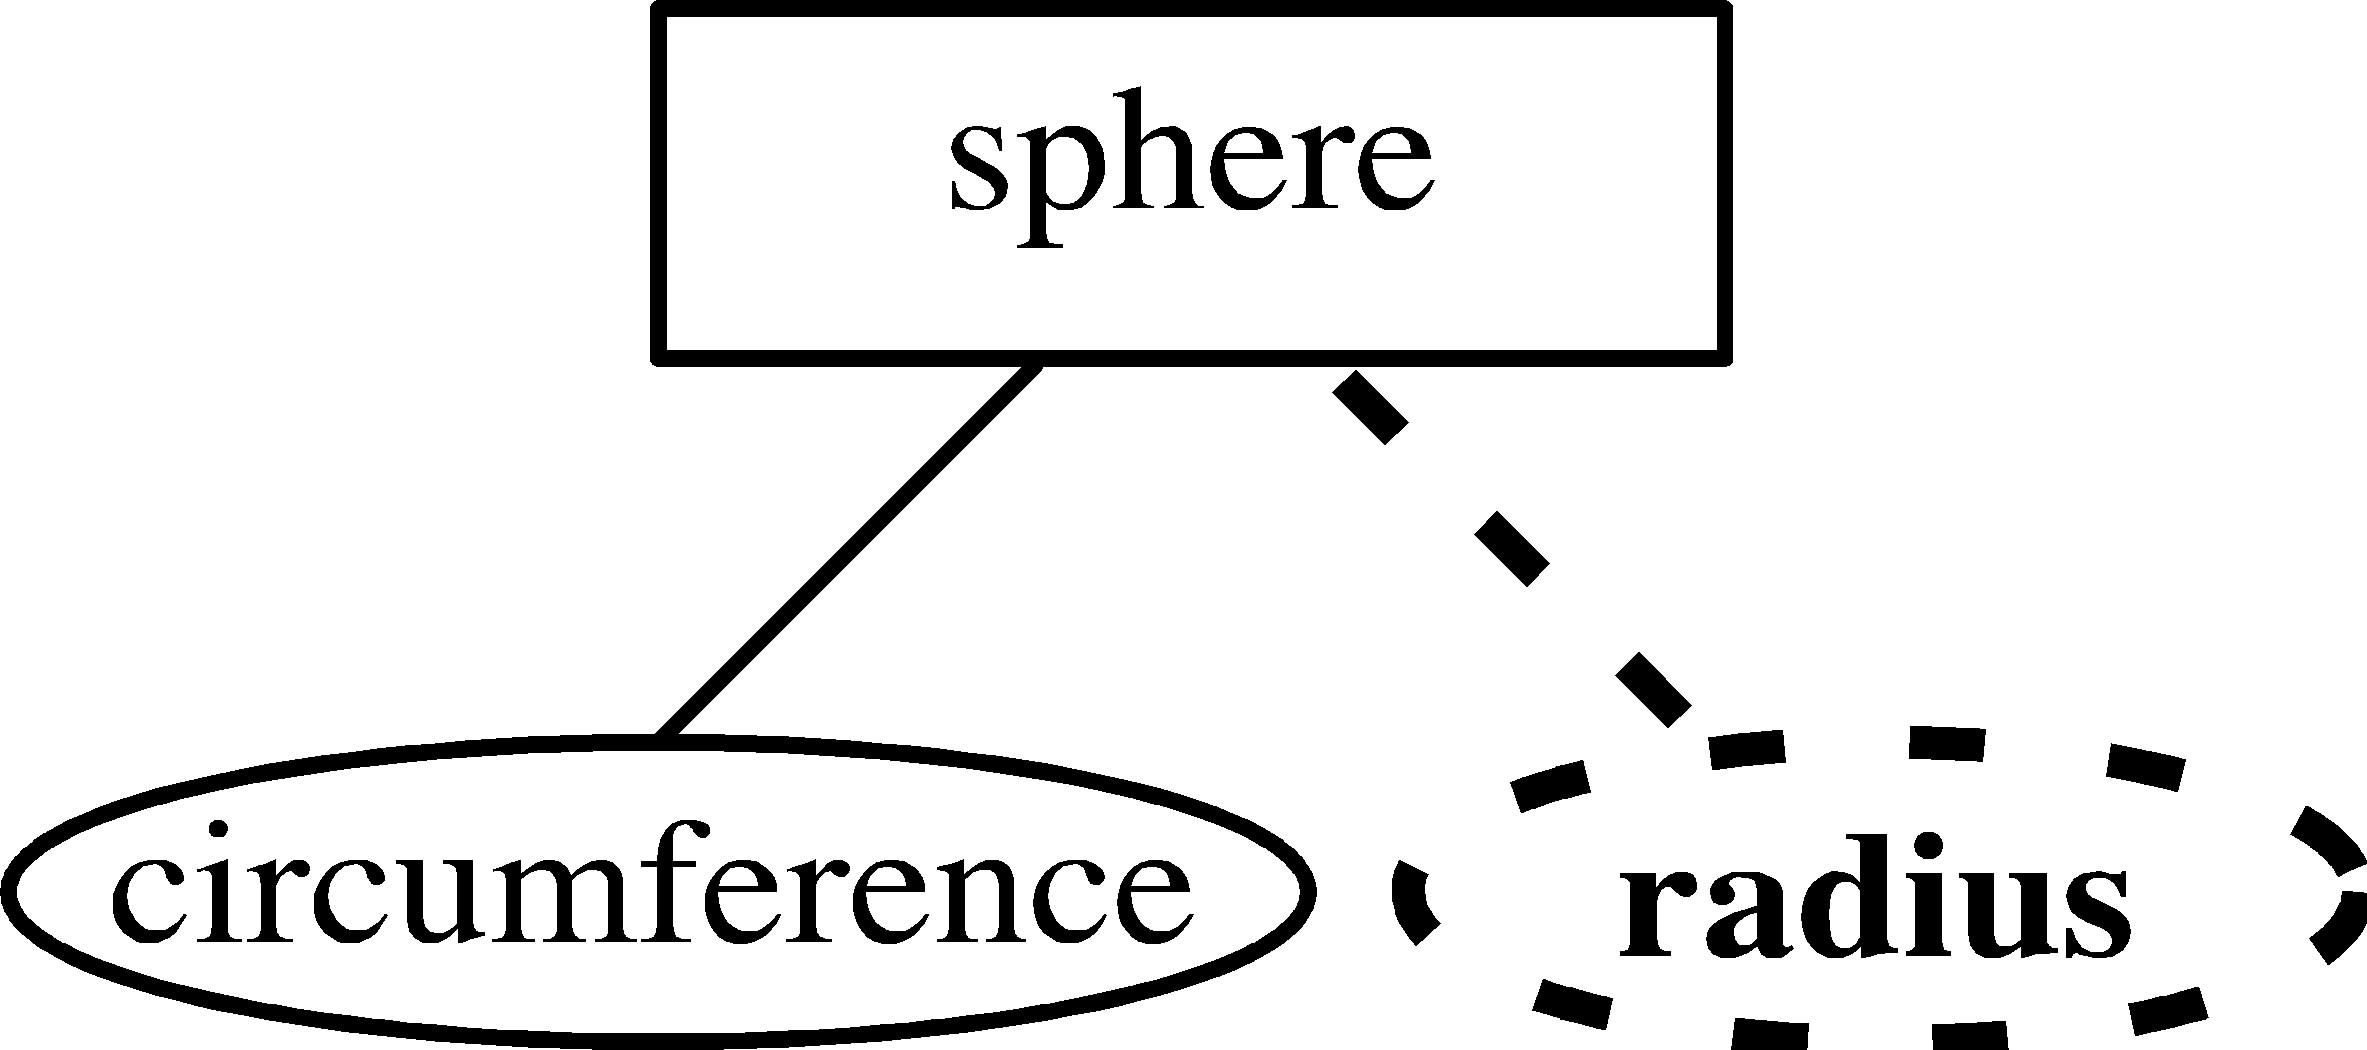 Entity-Relationship Model with Total Participation Er Diagram